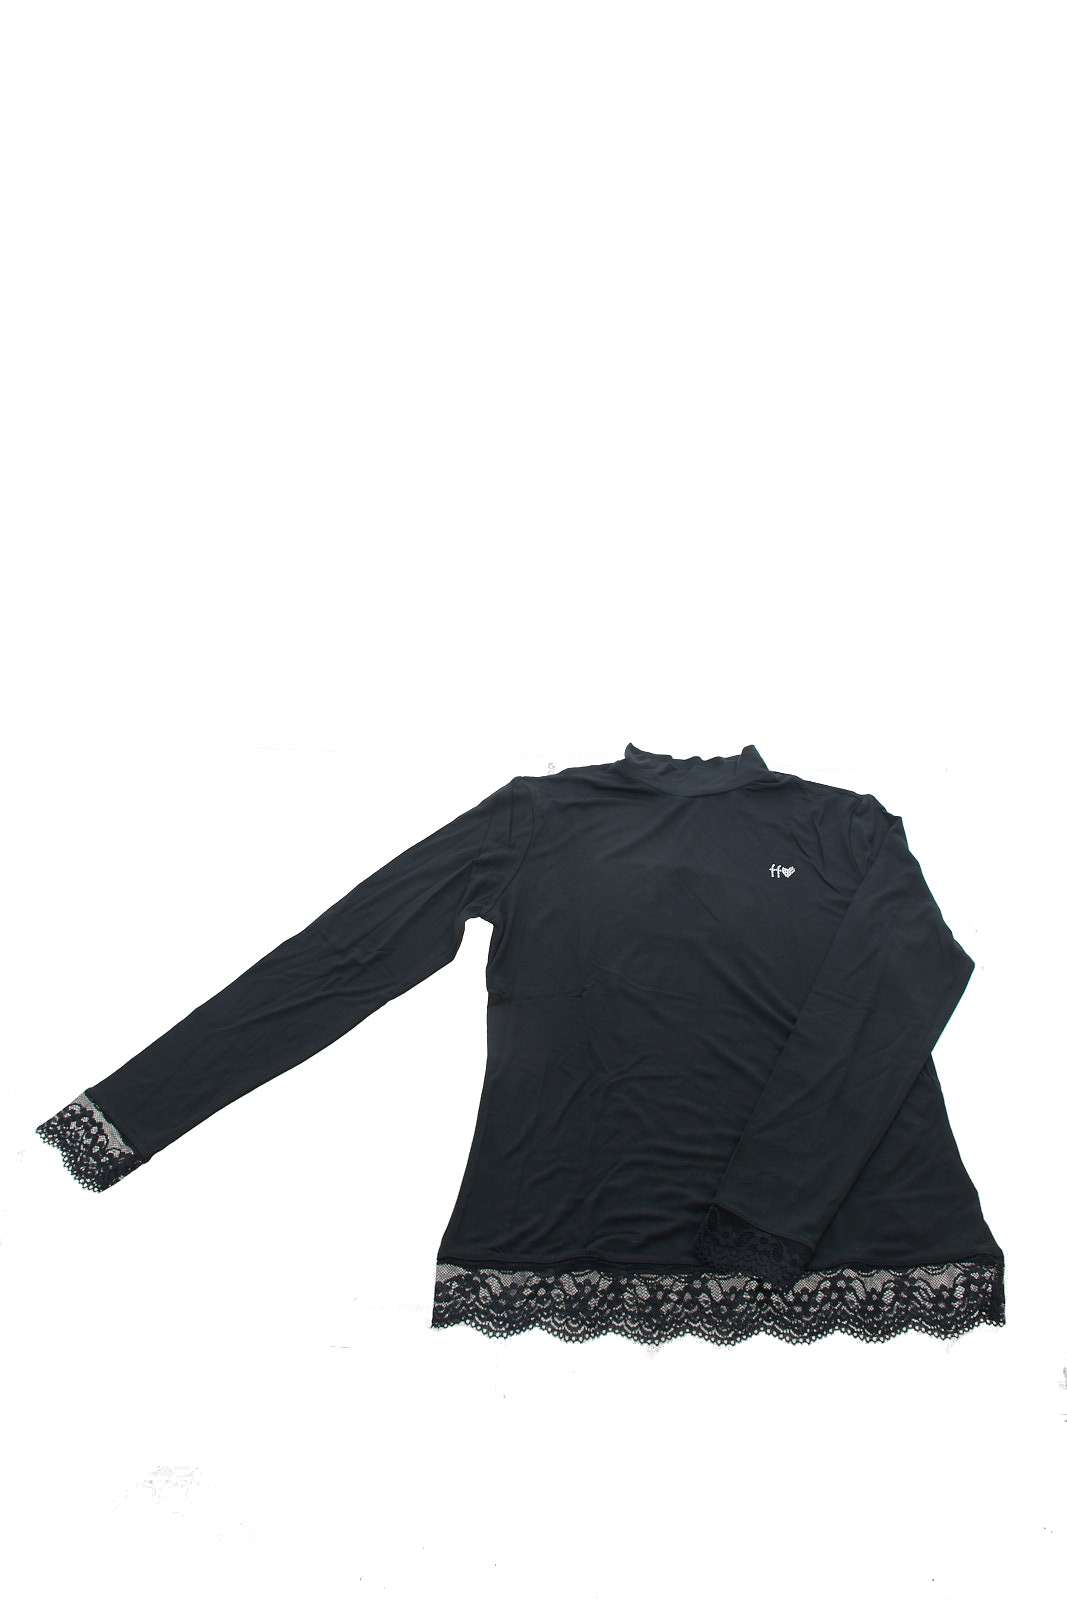 https://www.parmax.com/media/catalog/product/a/i/AI-outlet_parmax-maglia-bambina-Silvia%20Heach-mdji5010lu-A.jpg